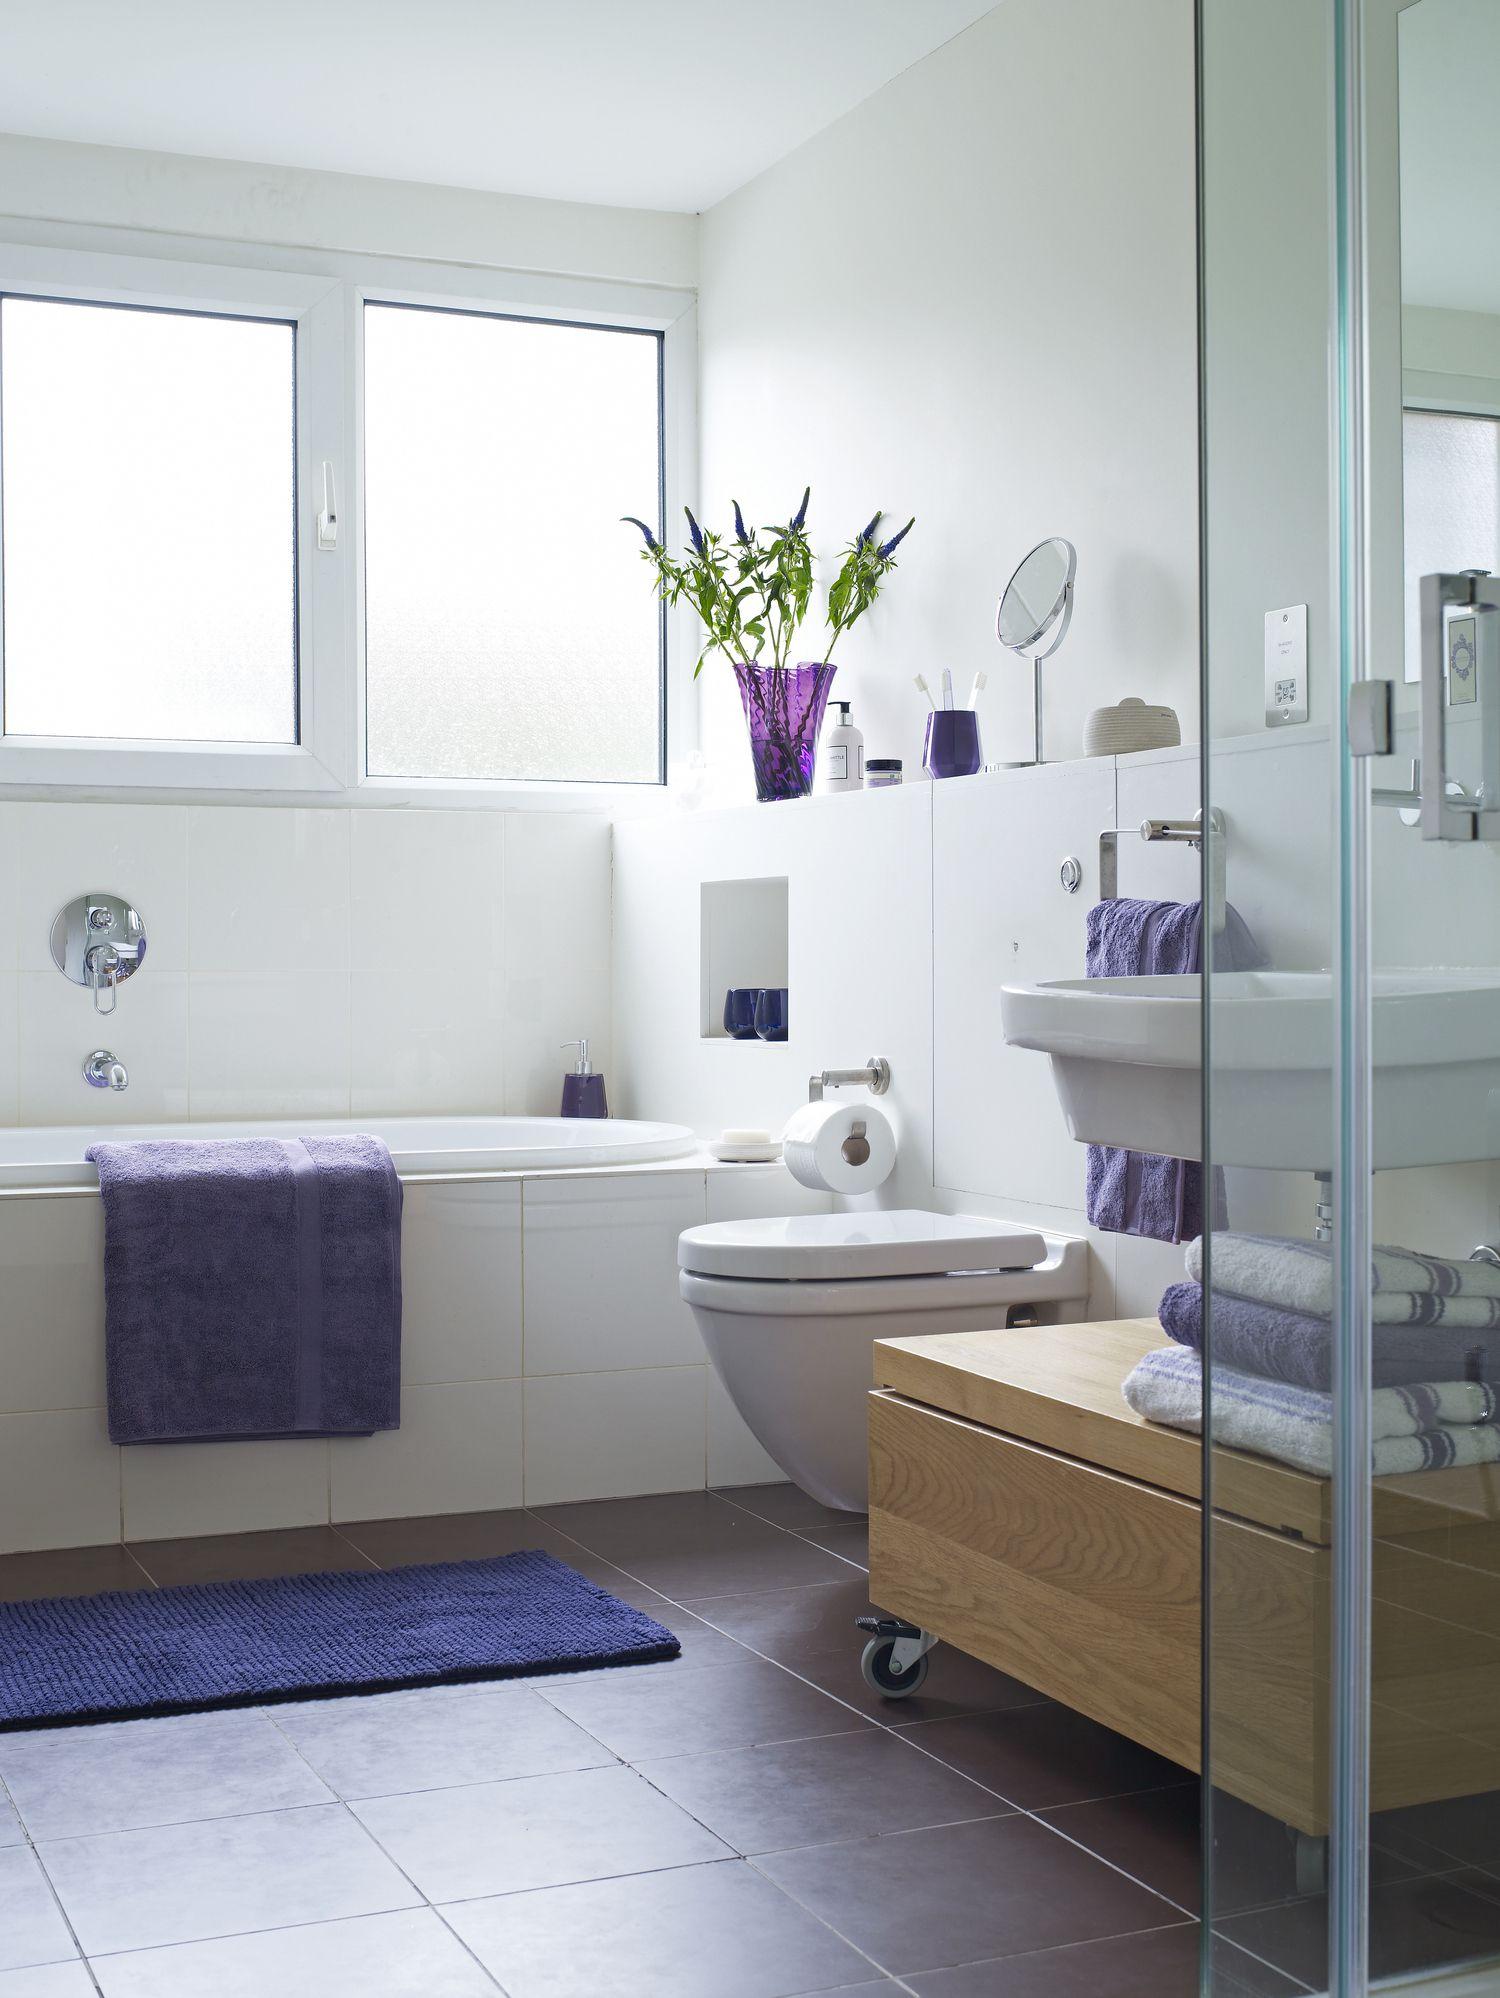 25 Killer Small Bathroom Design Tips on Small Restroom Ideas  id=90381